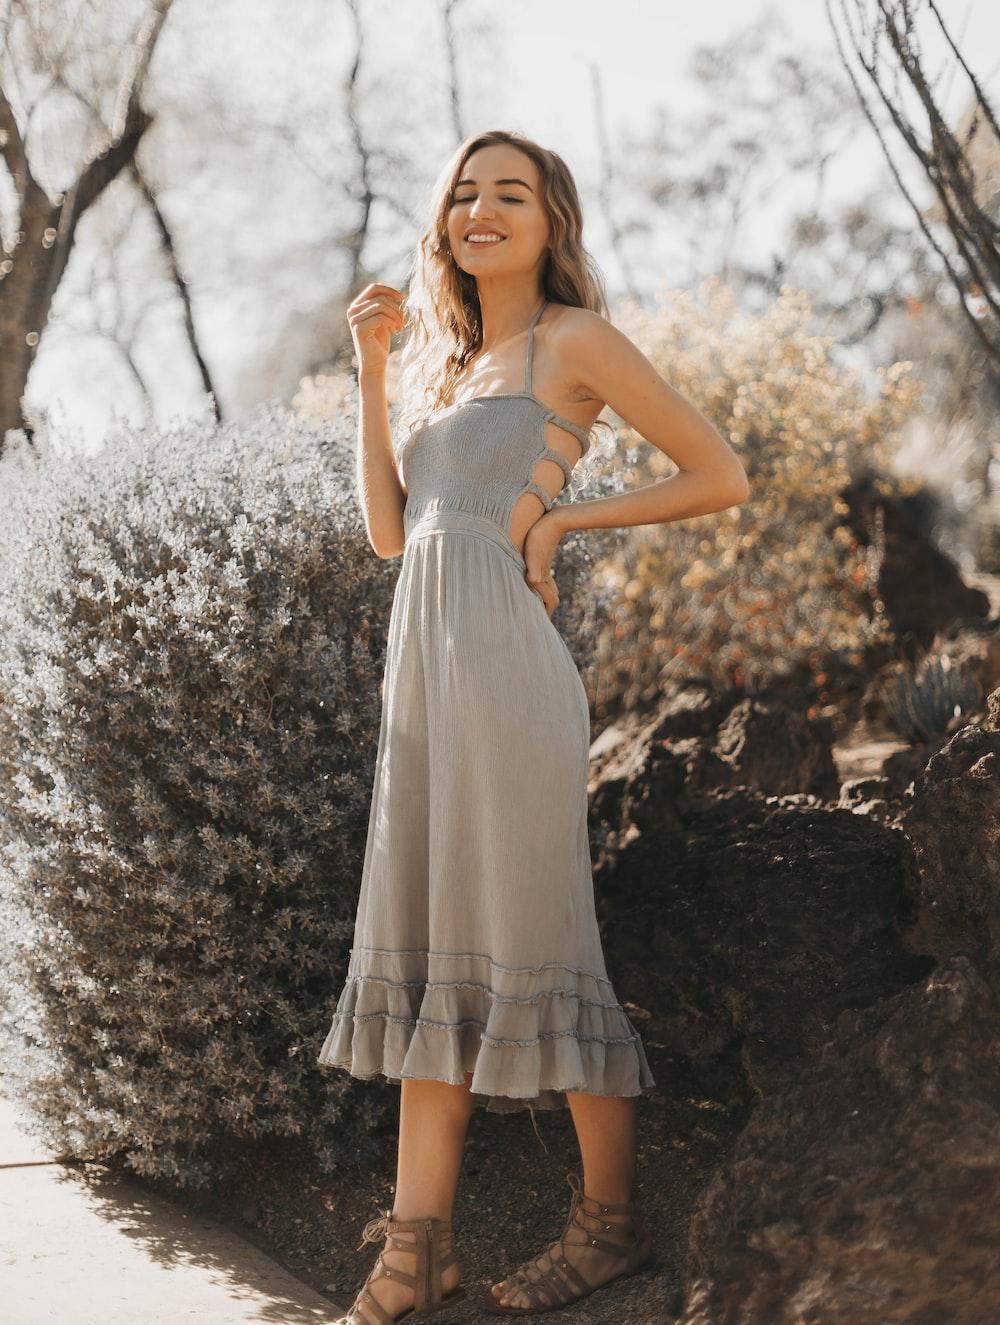 woman wearing grey halter dress standing near bush